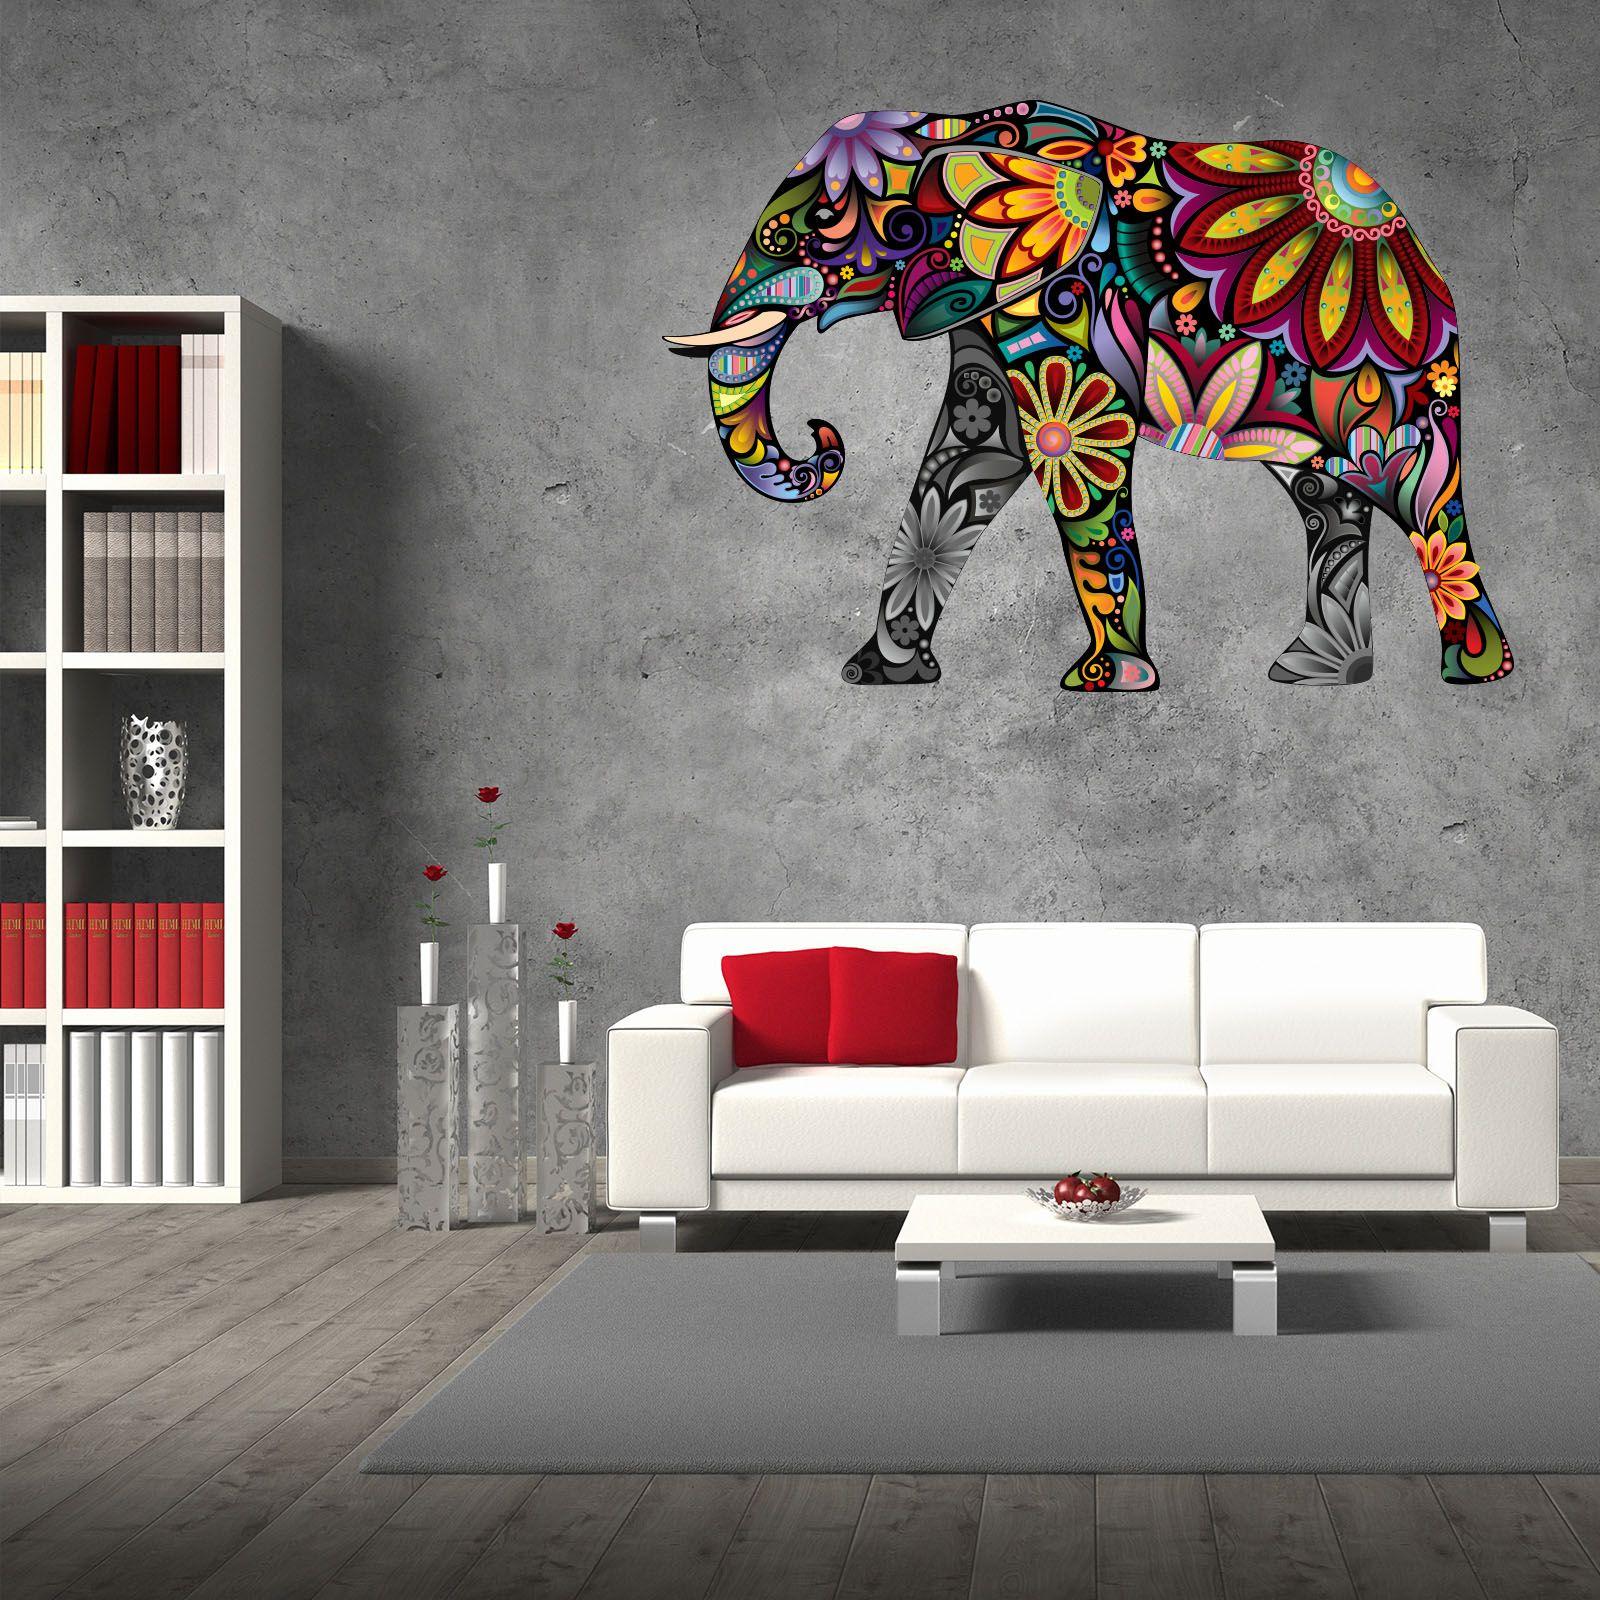 xxl wallprint wandtattoo elefant ornamente loft design. Black Bedroom Furniture Sets. Home Design Ideas